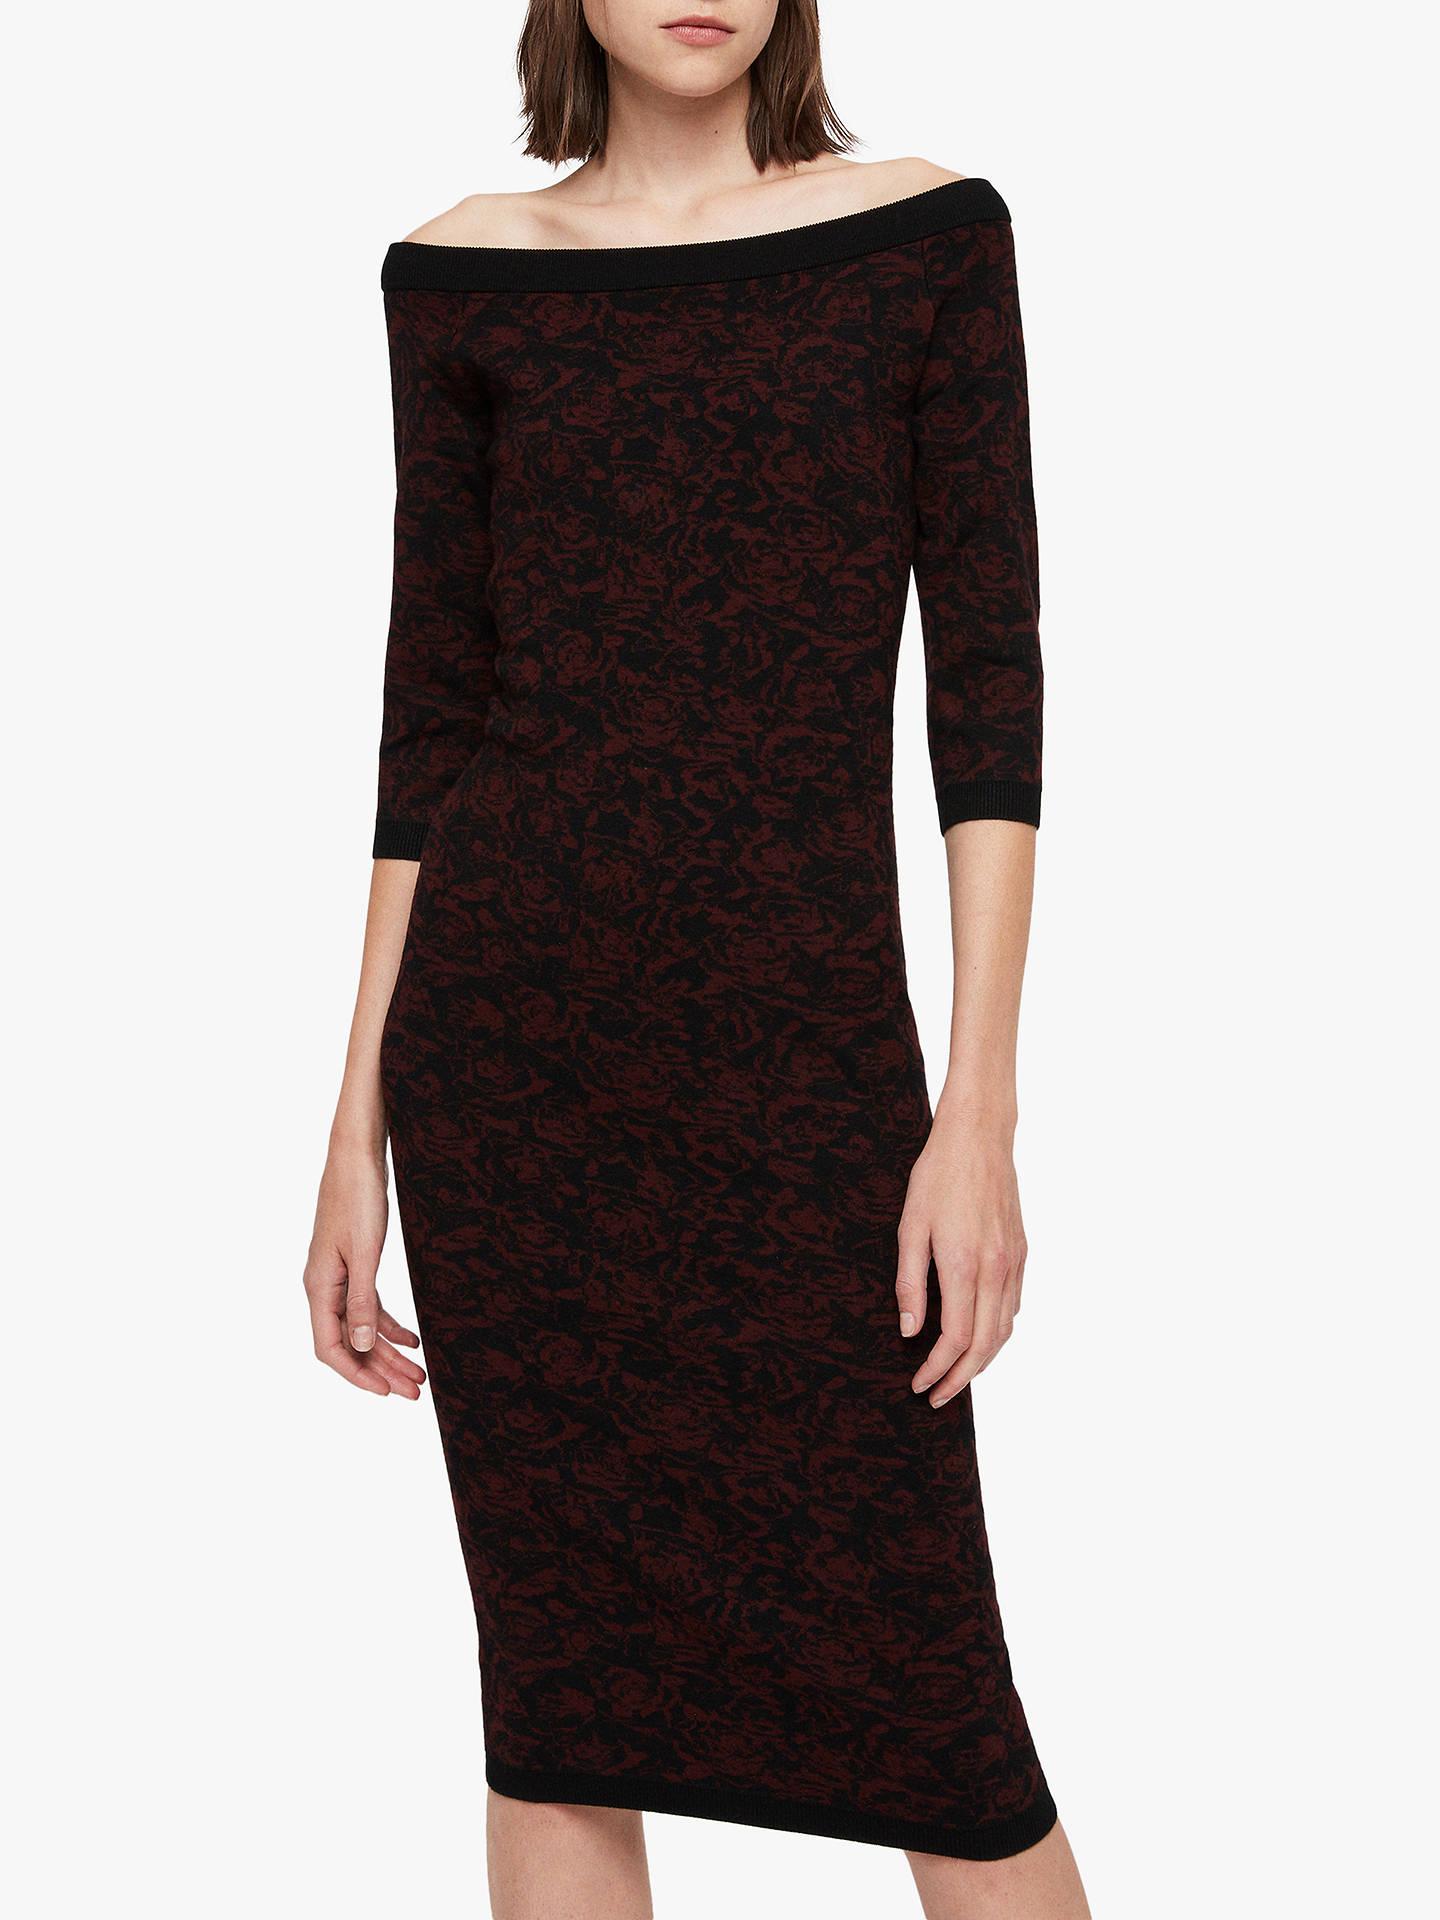 Ana Rose allsaints ana rose dress, black at john lewis & partners